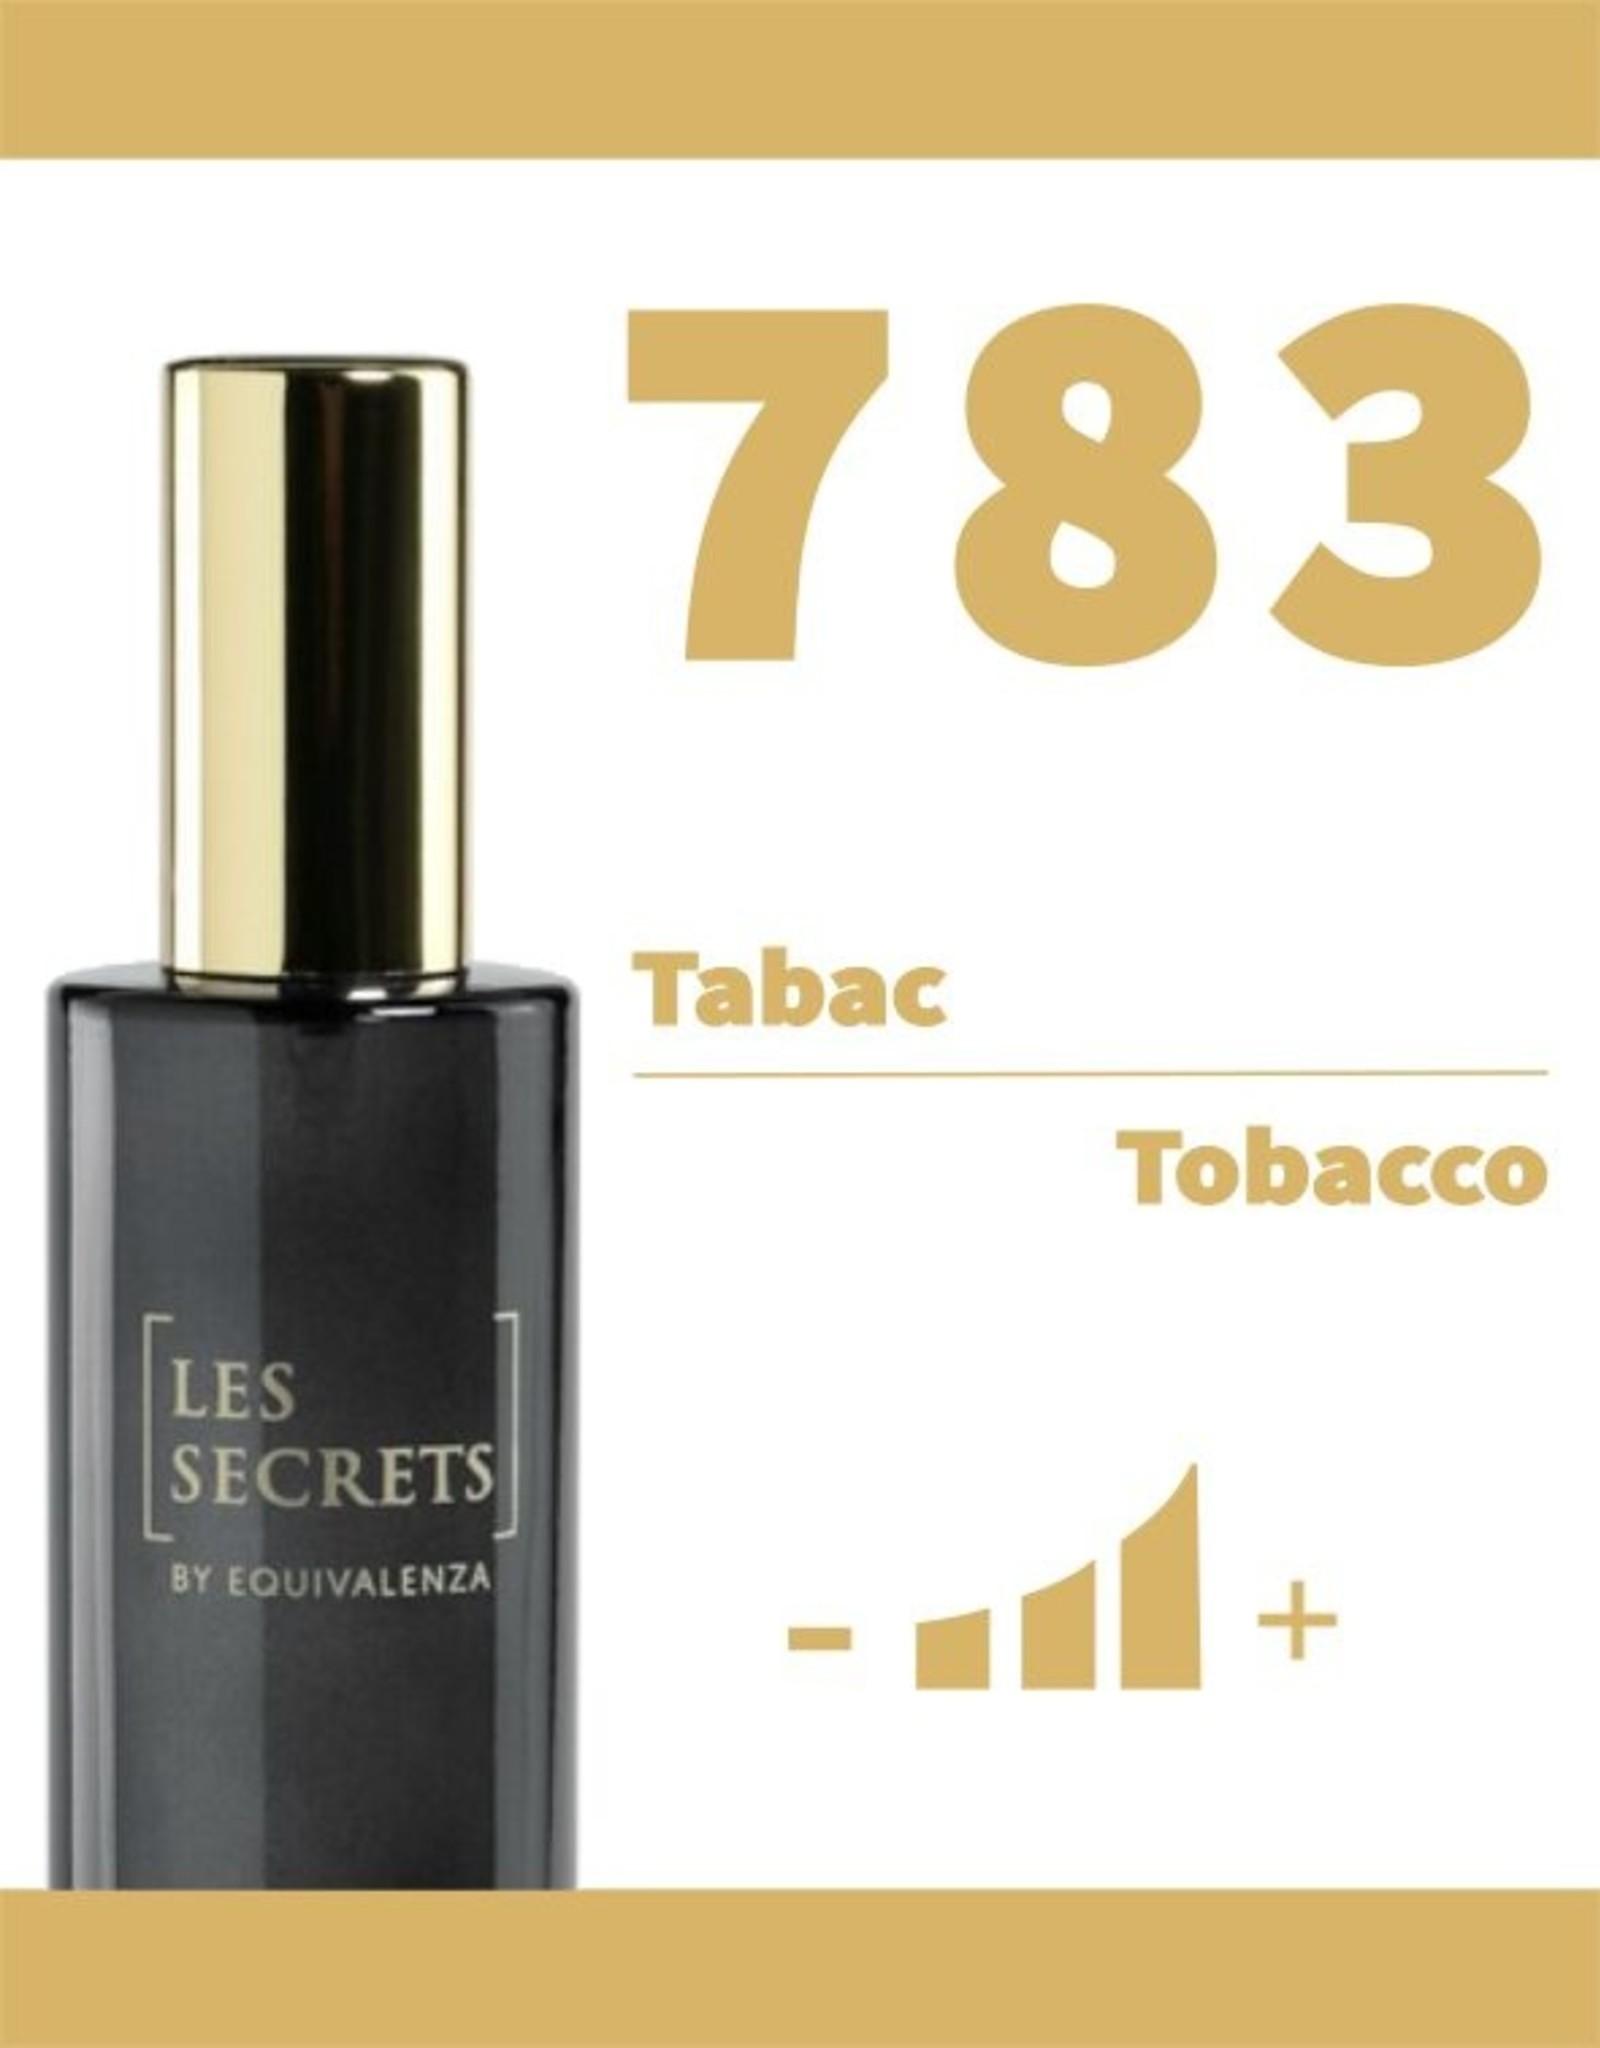 Equivalenza Tabac 783